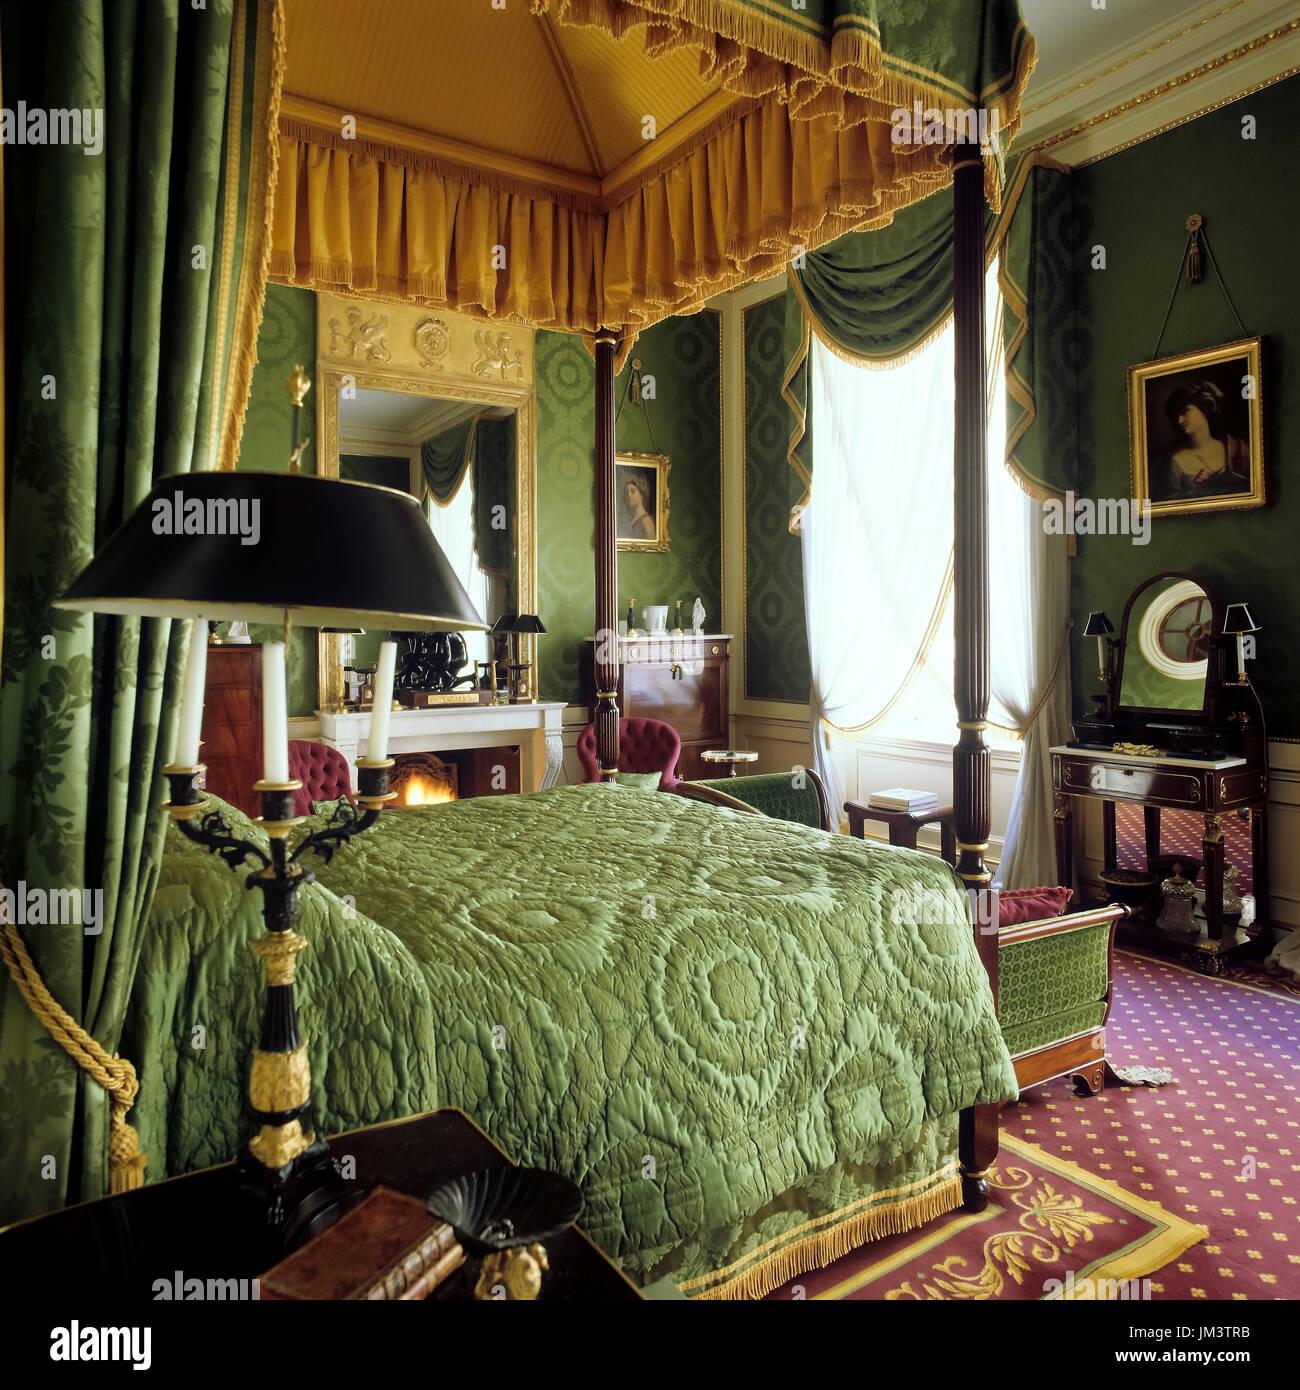 victorian style bedroom stock photos victorian style bedroom stock rh alamy com victorian style bedroom bench victorian style bedroom sets